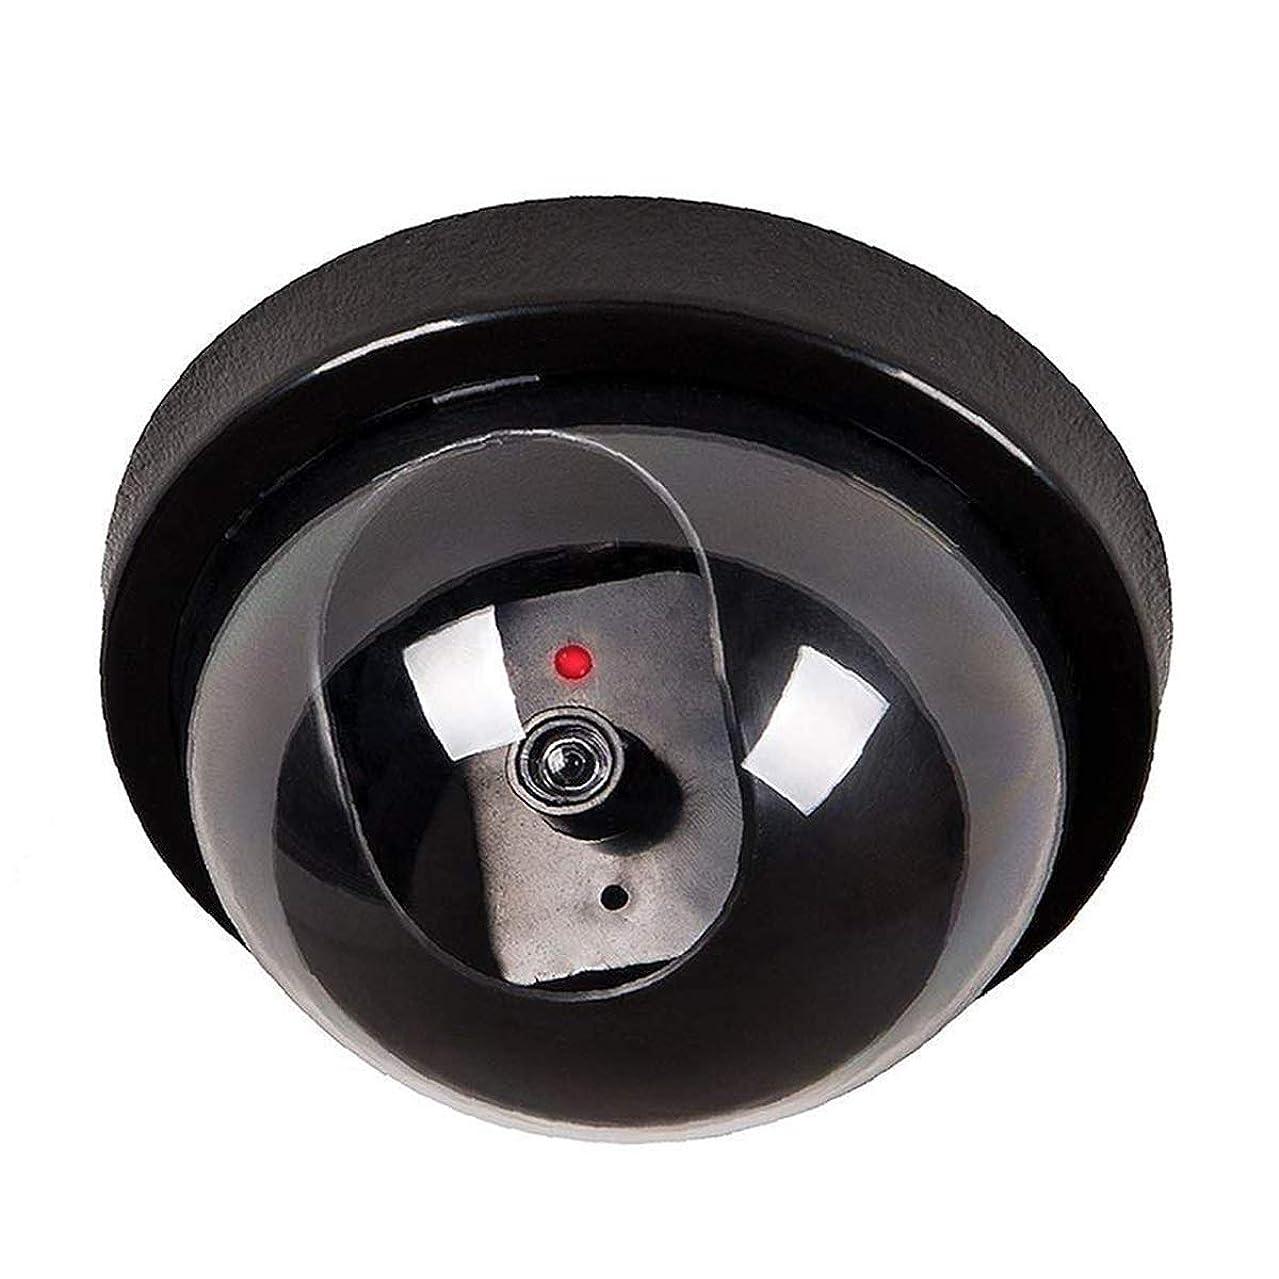 WALI Security Camera CCTV PTZ Dome Dummy Camera